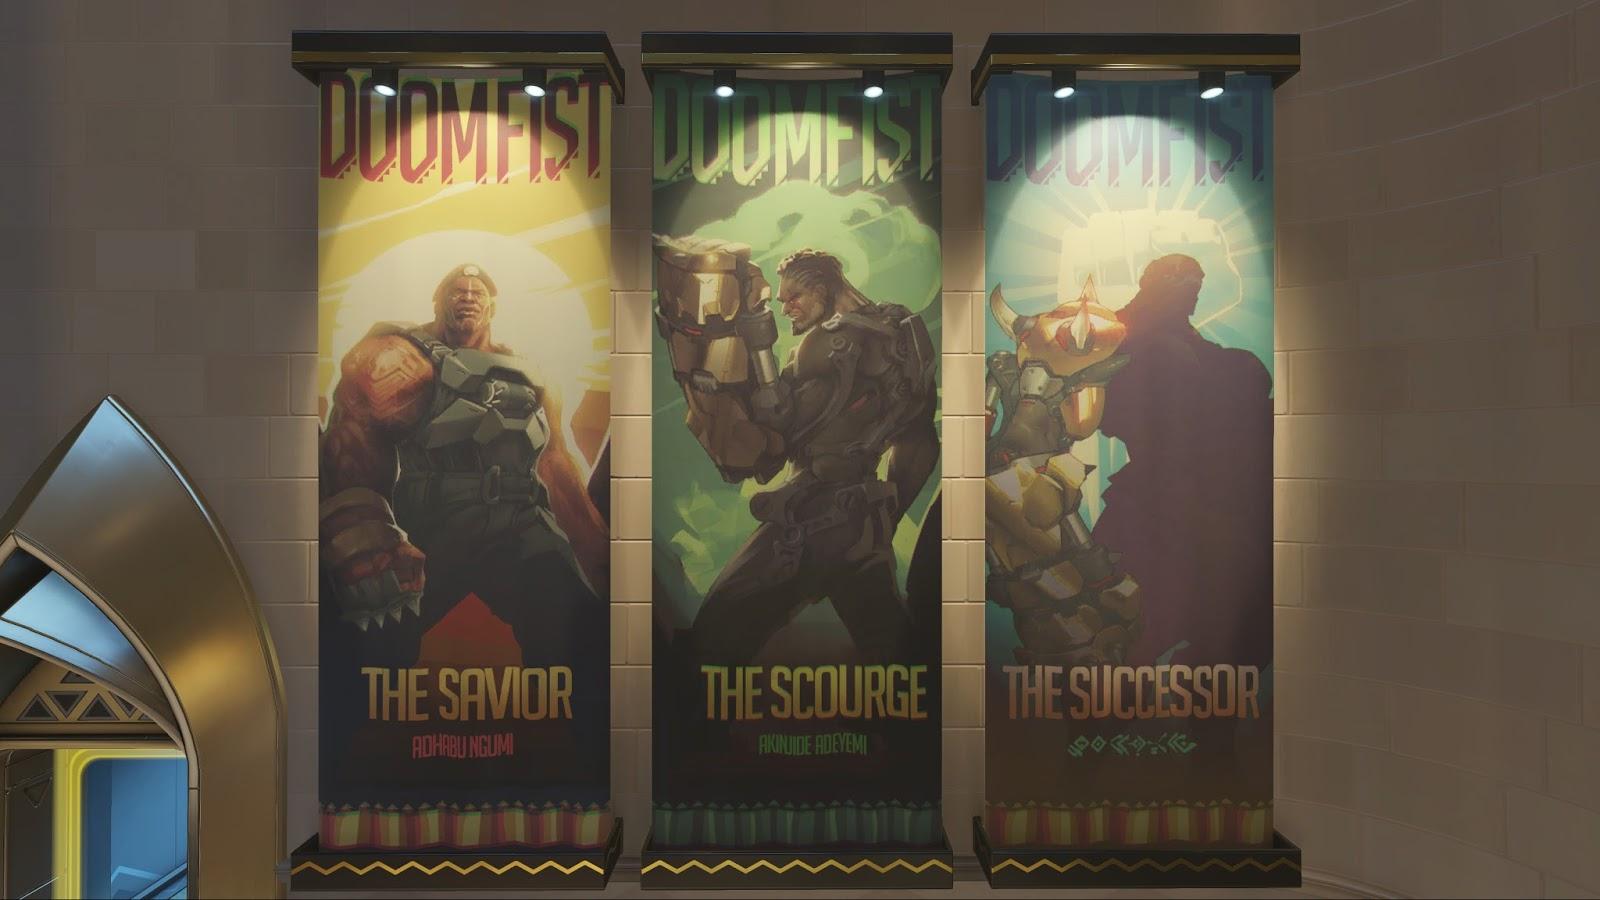 Doomfist por fin llega a Overwatch